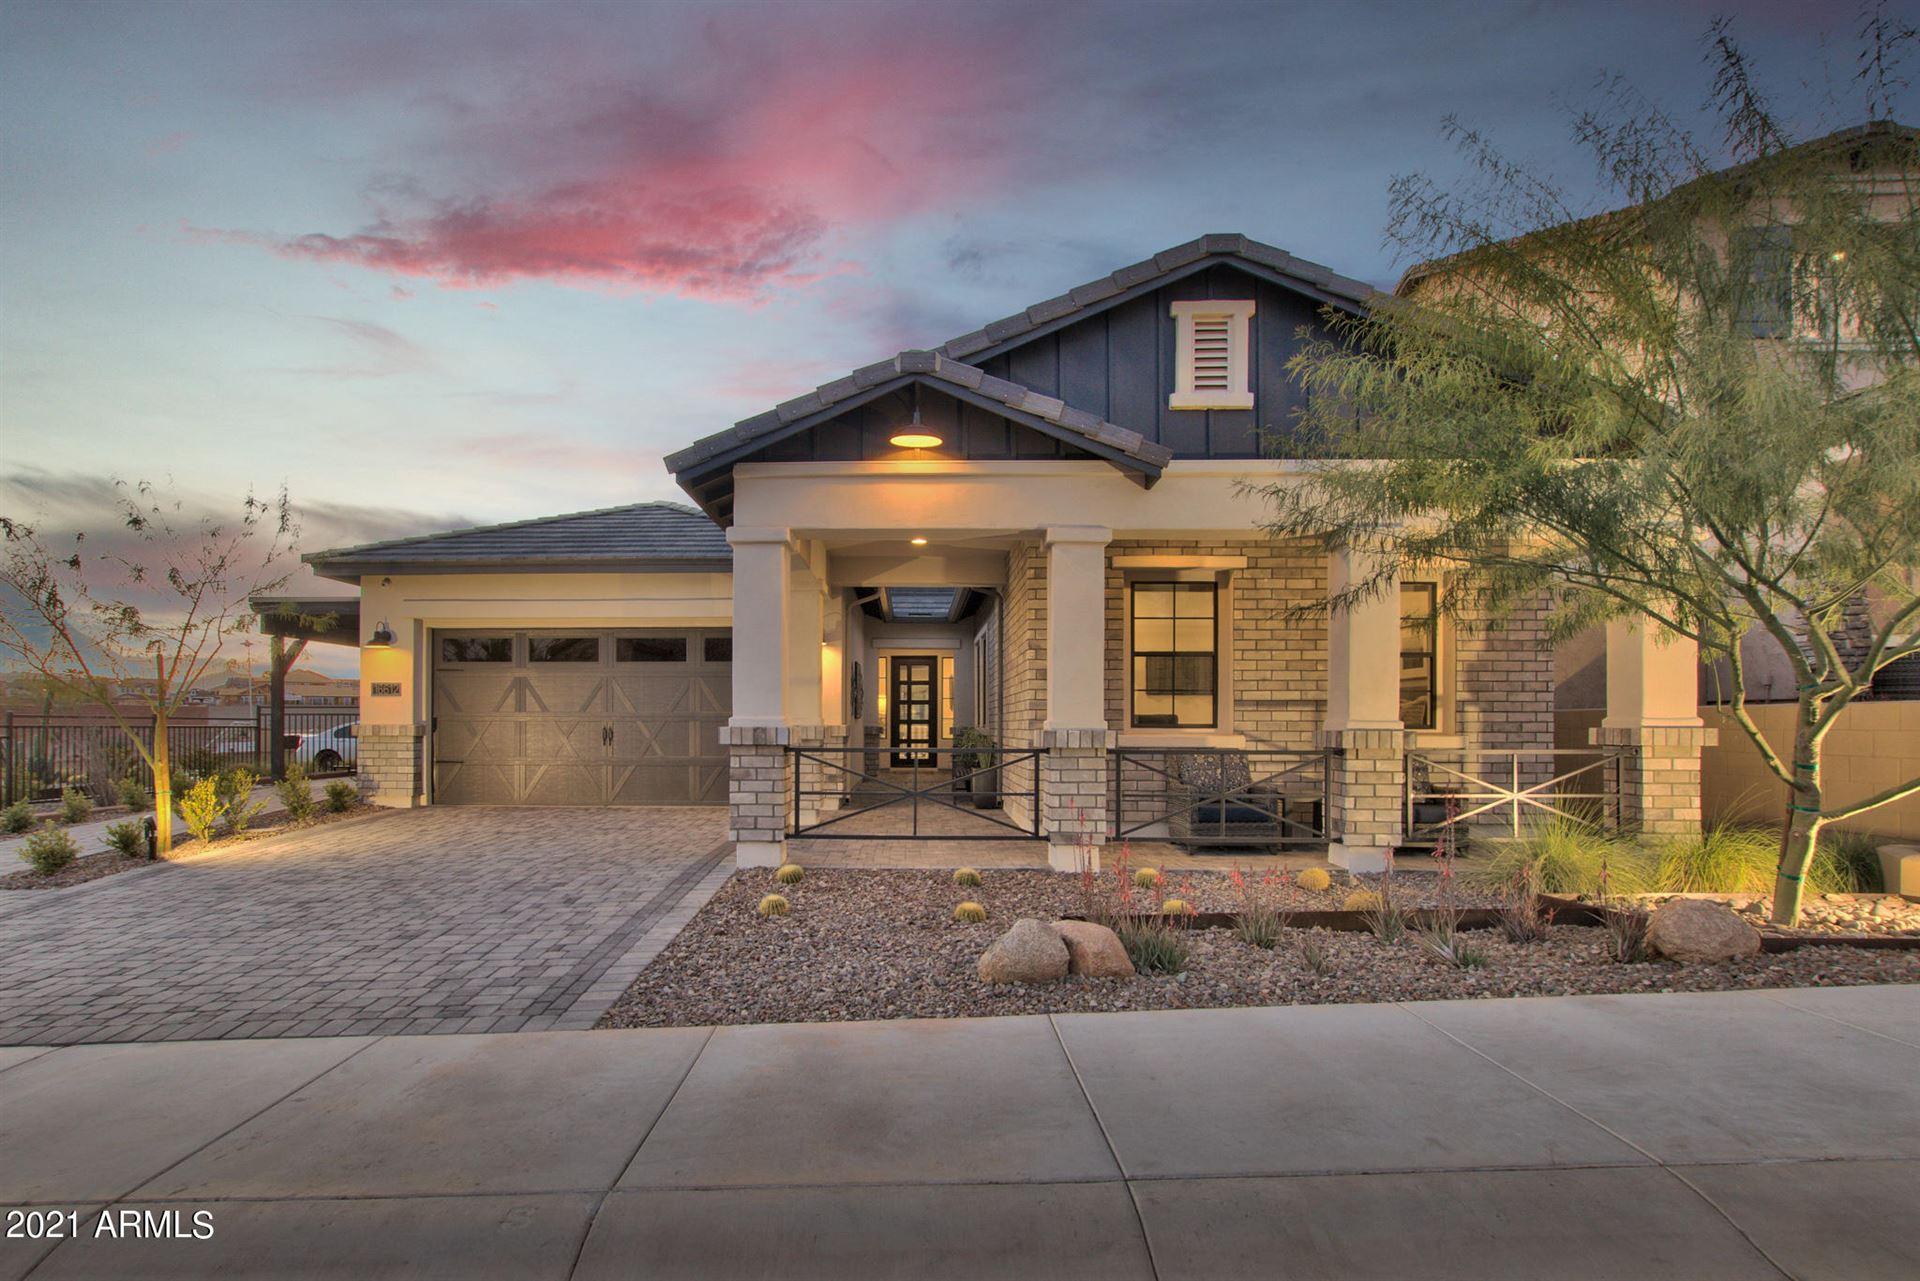 710 E ASHURST Drive, Phoenix, AZ 85048 - #: 6174244